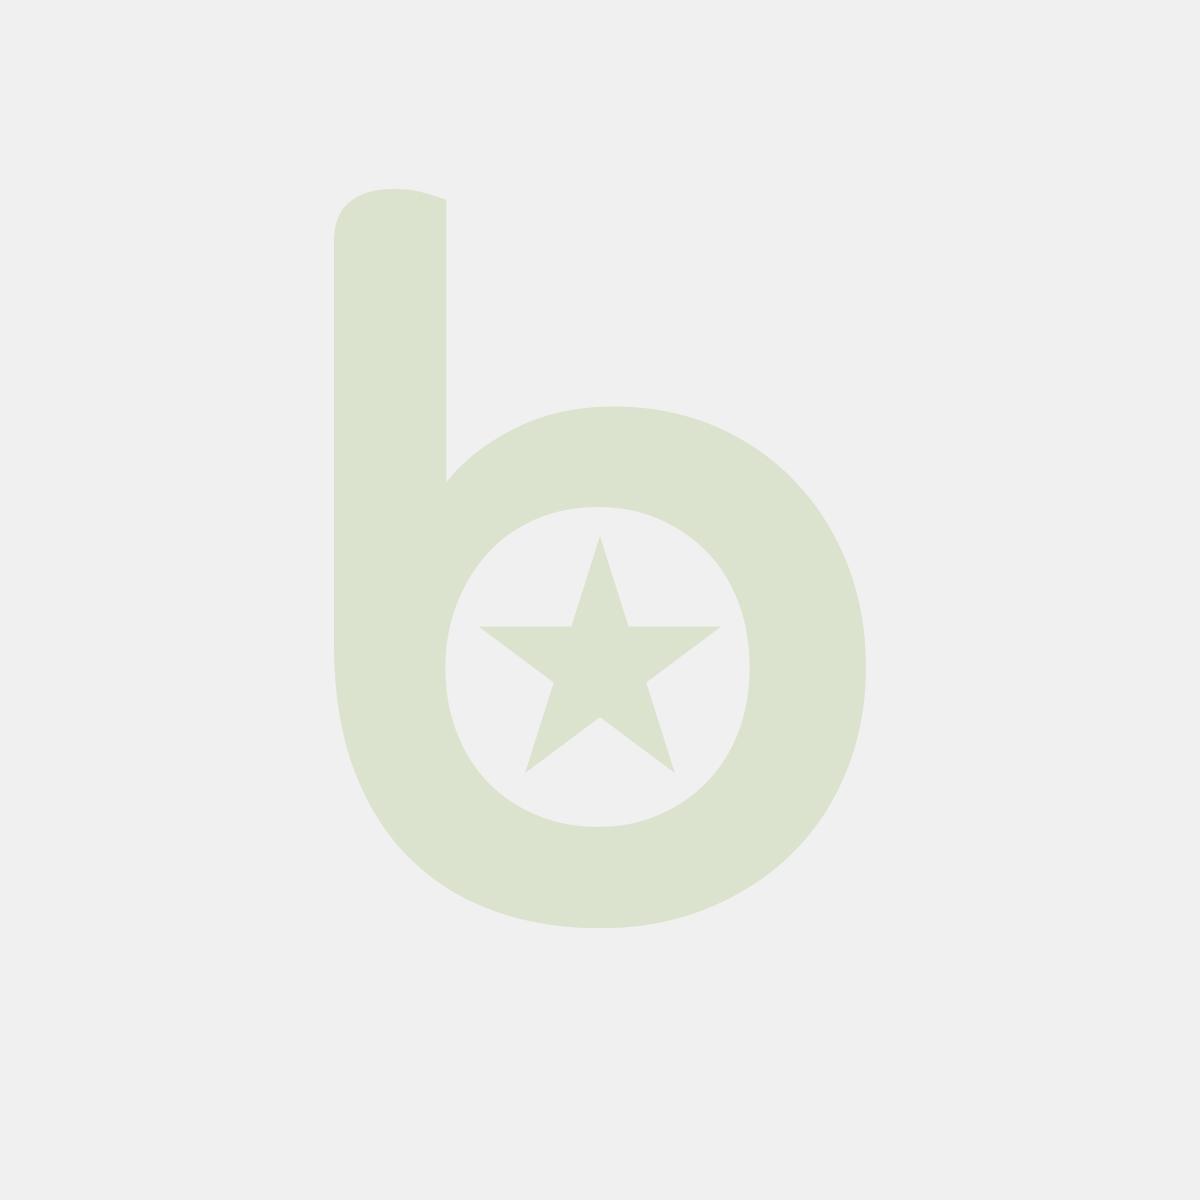 Taca drewnopodobna prostokątna 32x17cm szara GN1/3, melamina